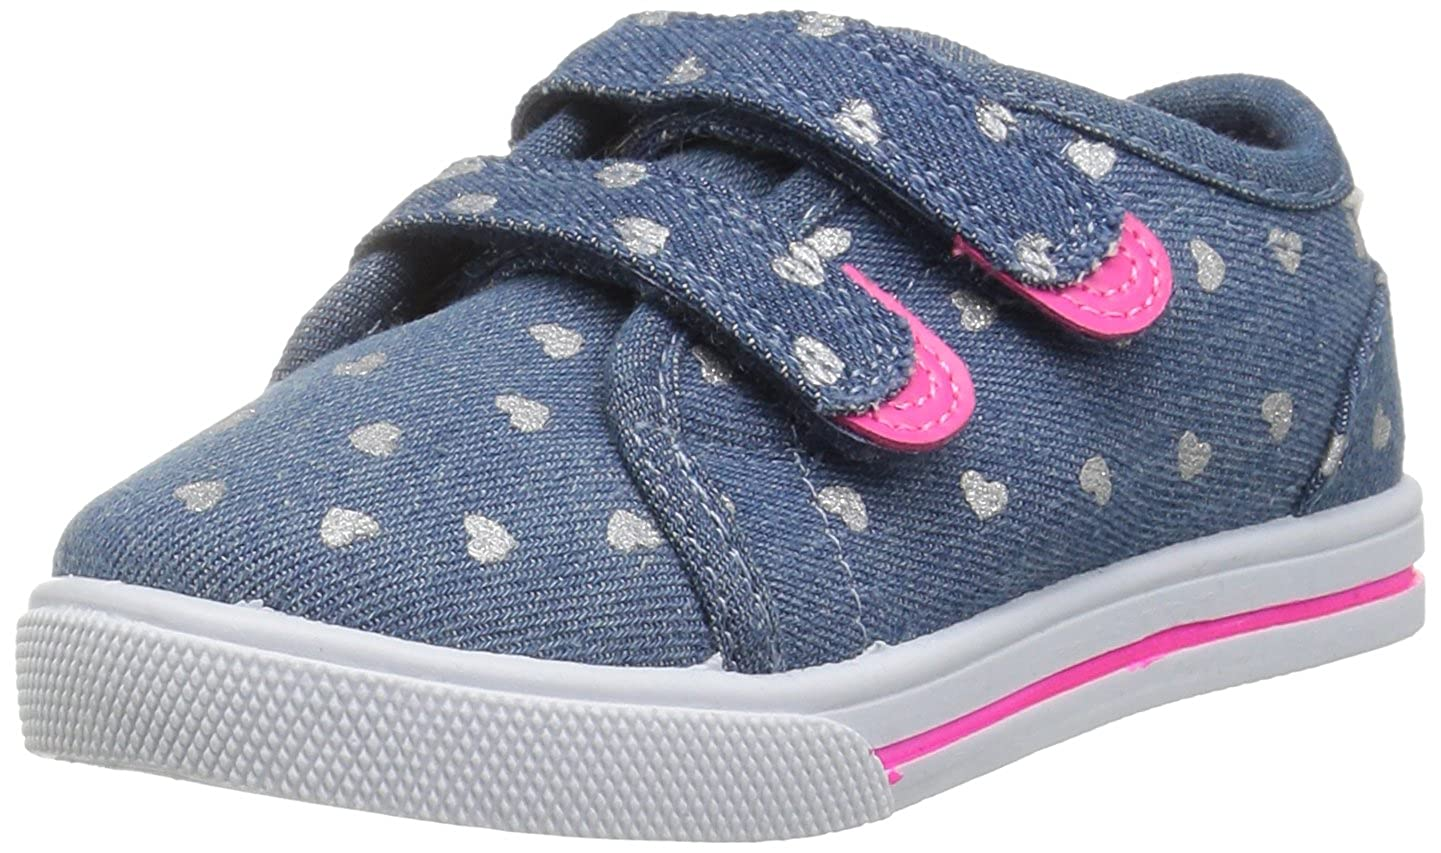 carter's Kids' Nikki2 Girl's Casual Sneaker Carter' s NIKKI2 - K